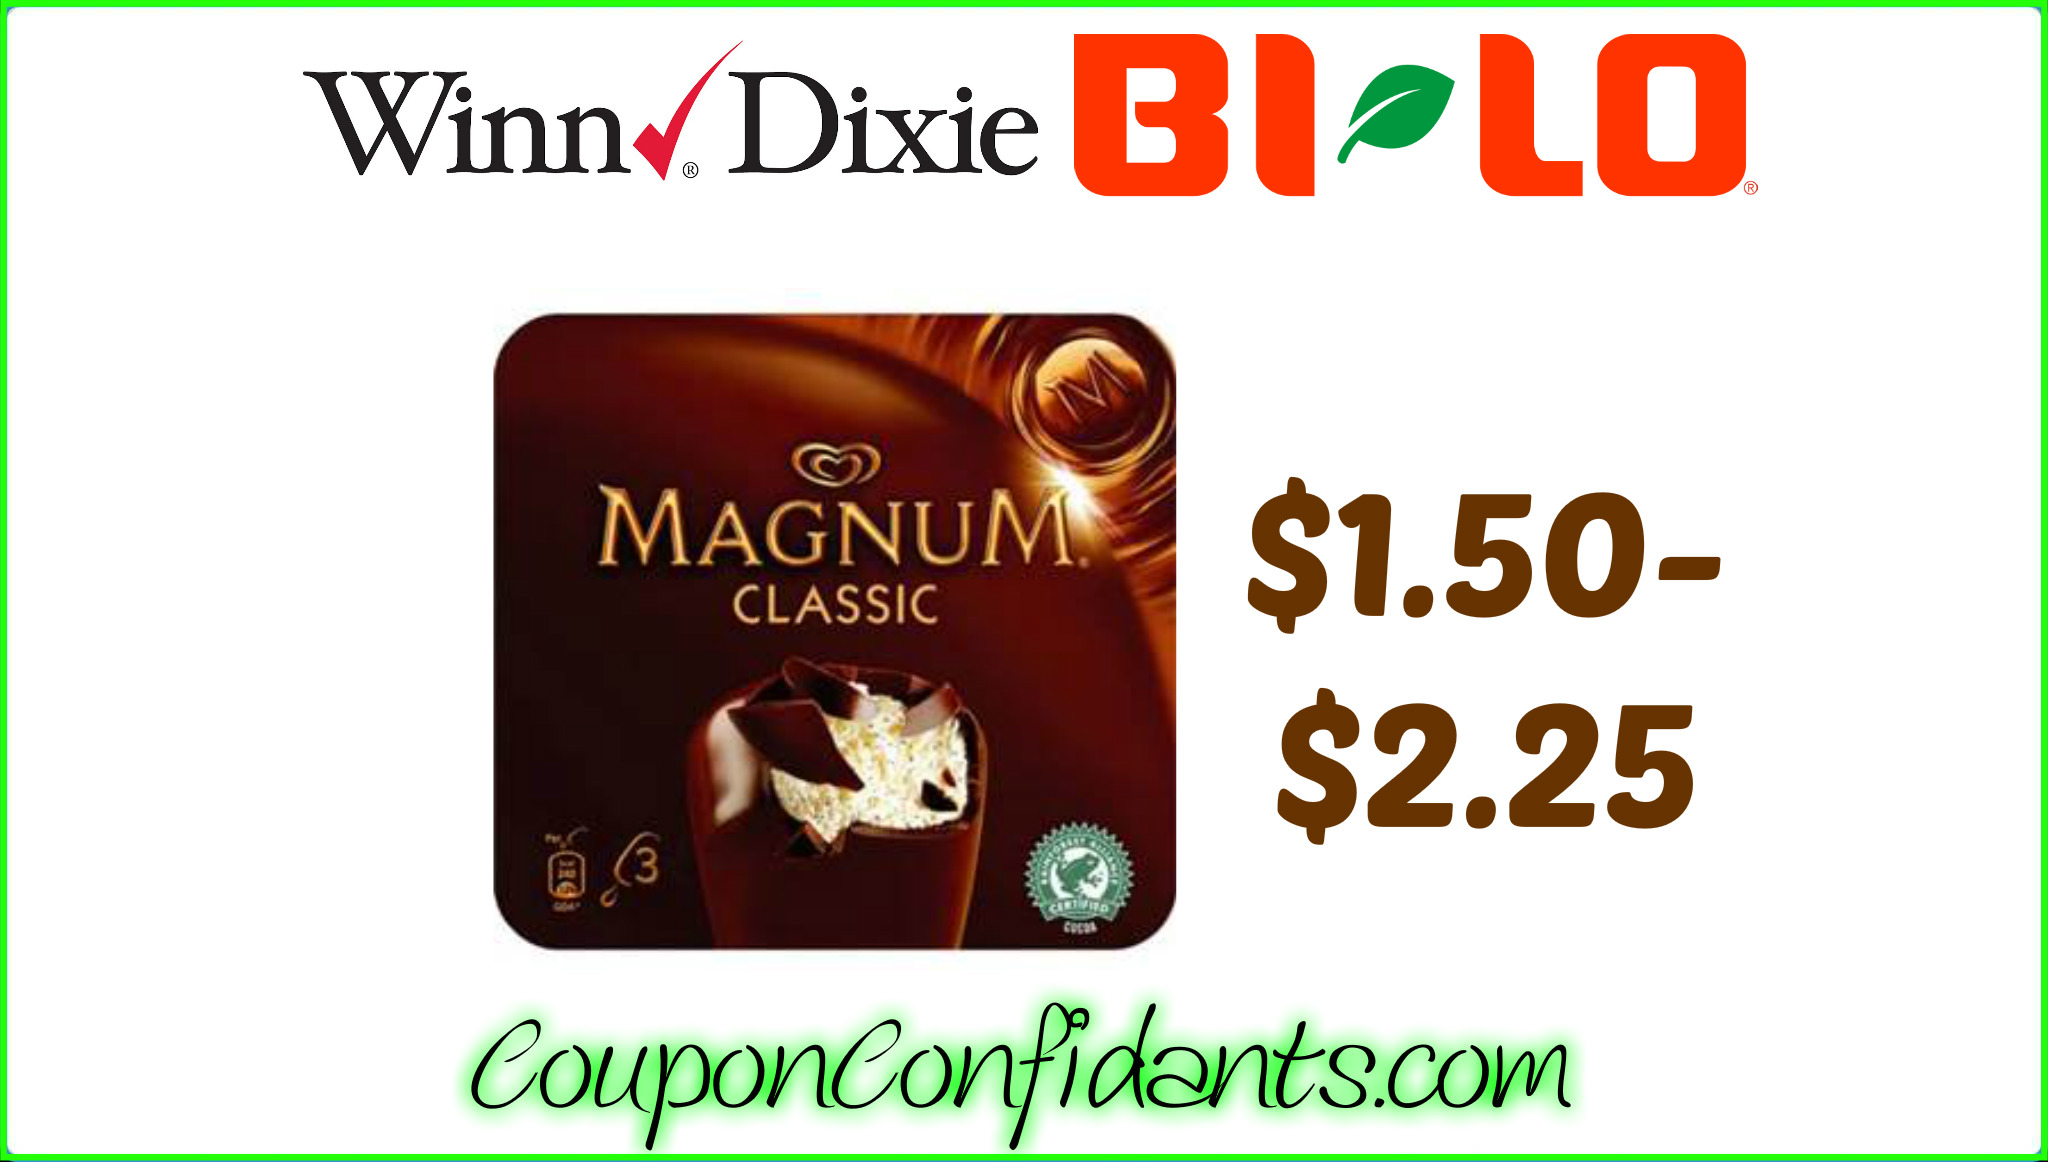 Last Chance to Print!!! Magnum Ice Cream at Bi-lo & Winn Dixie!